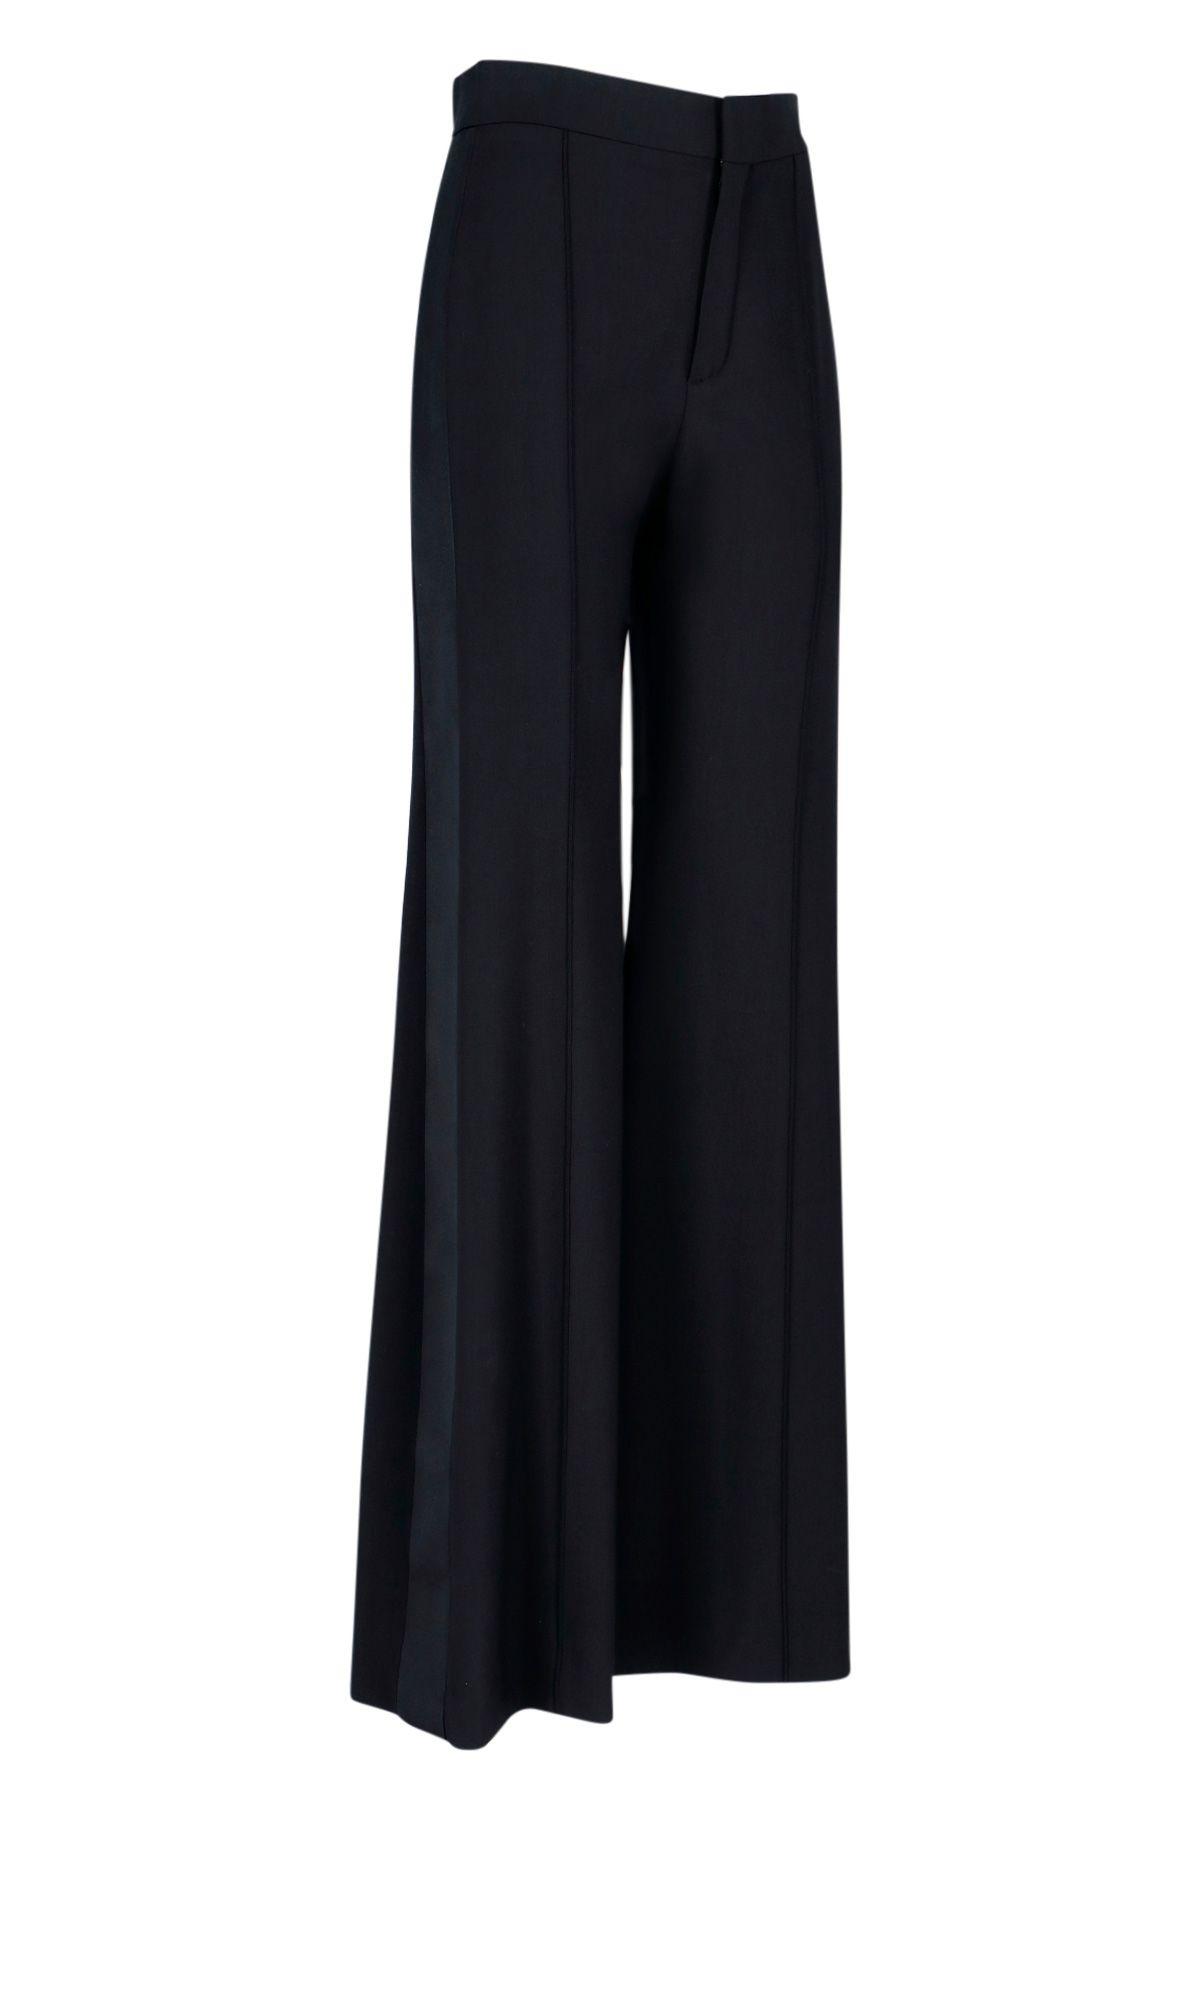 CHLOÉ Wide leg pants CHLOÉ WOMEN'S BLACK SYNTHETIC FIBERS PANTS